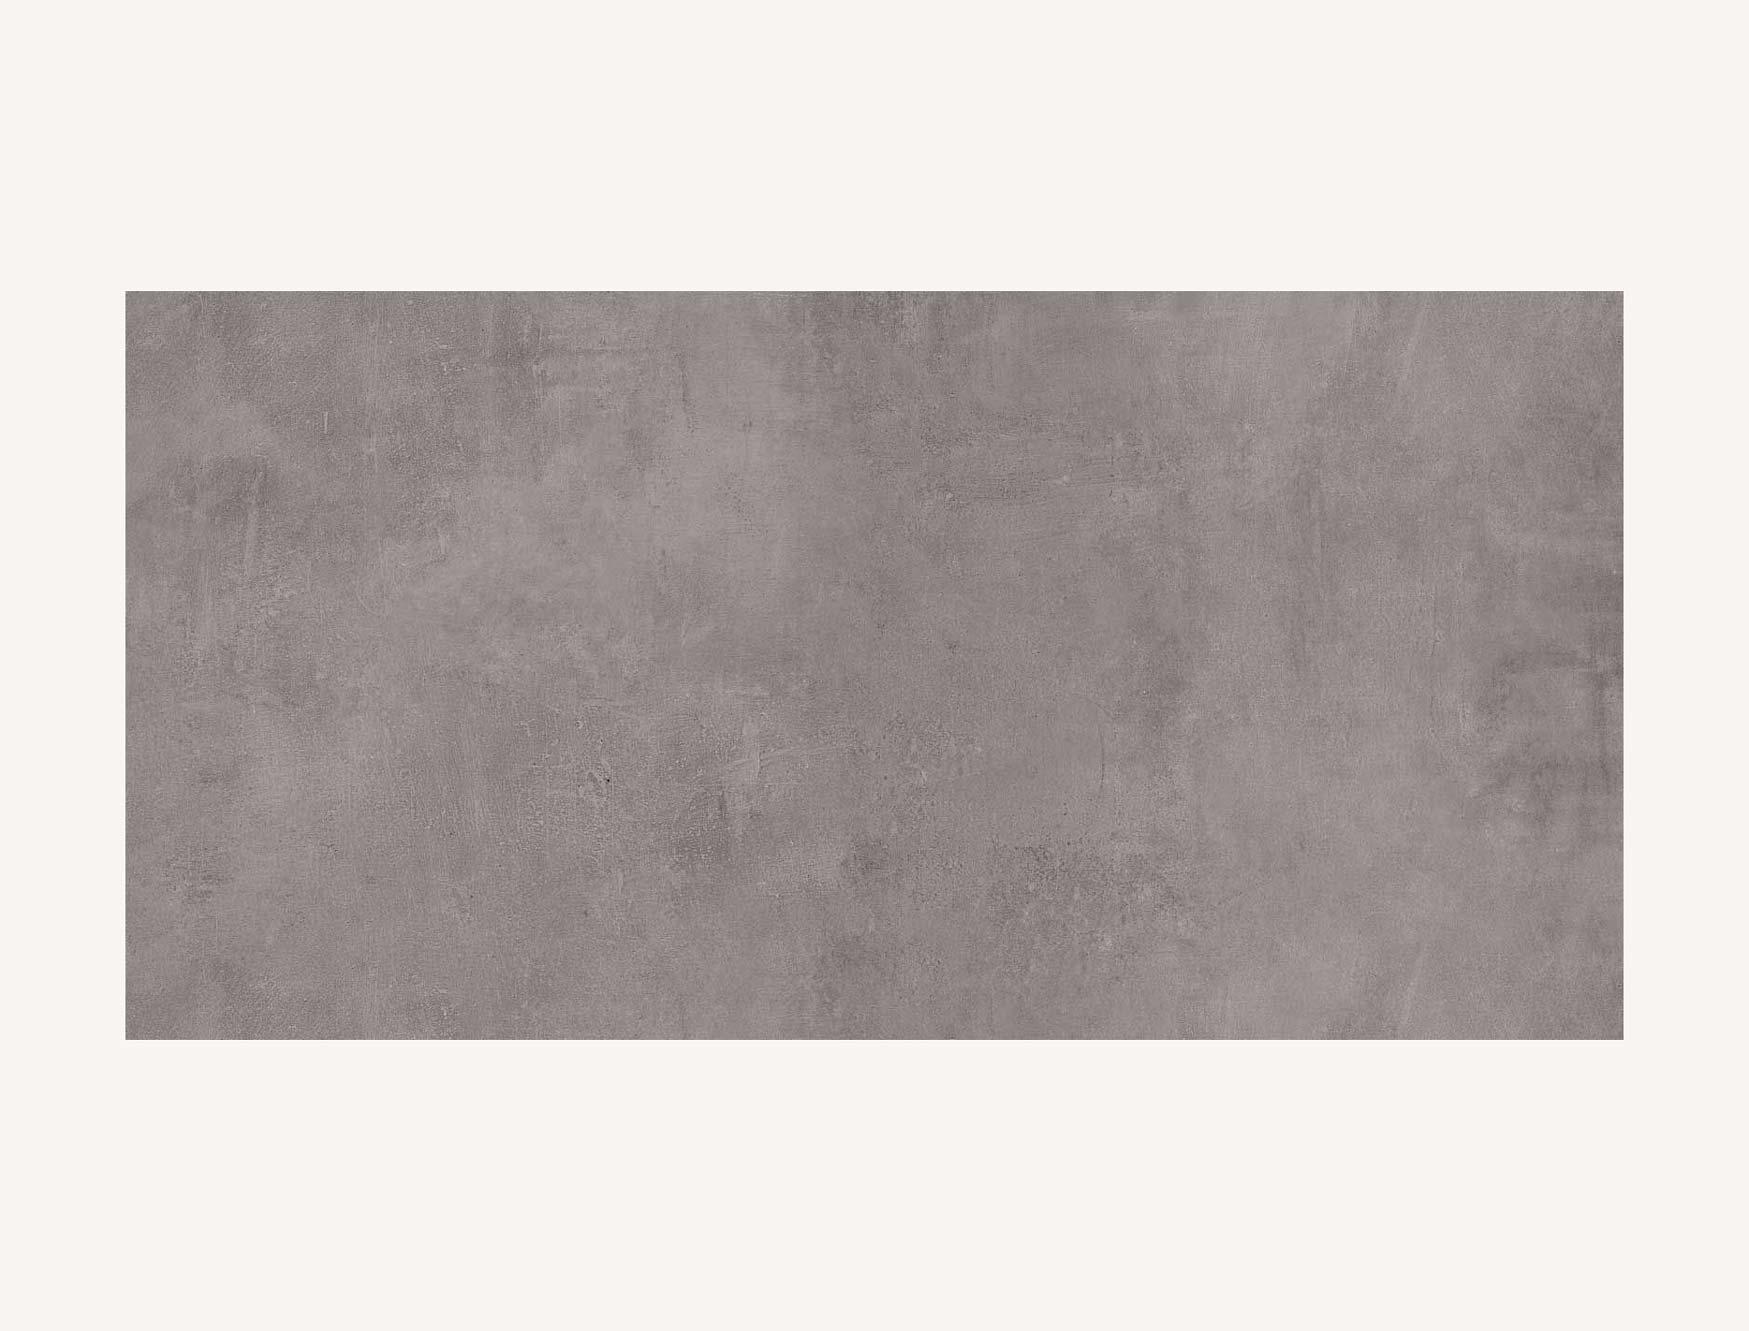 Aria grey Rectified Porcelain Tile